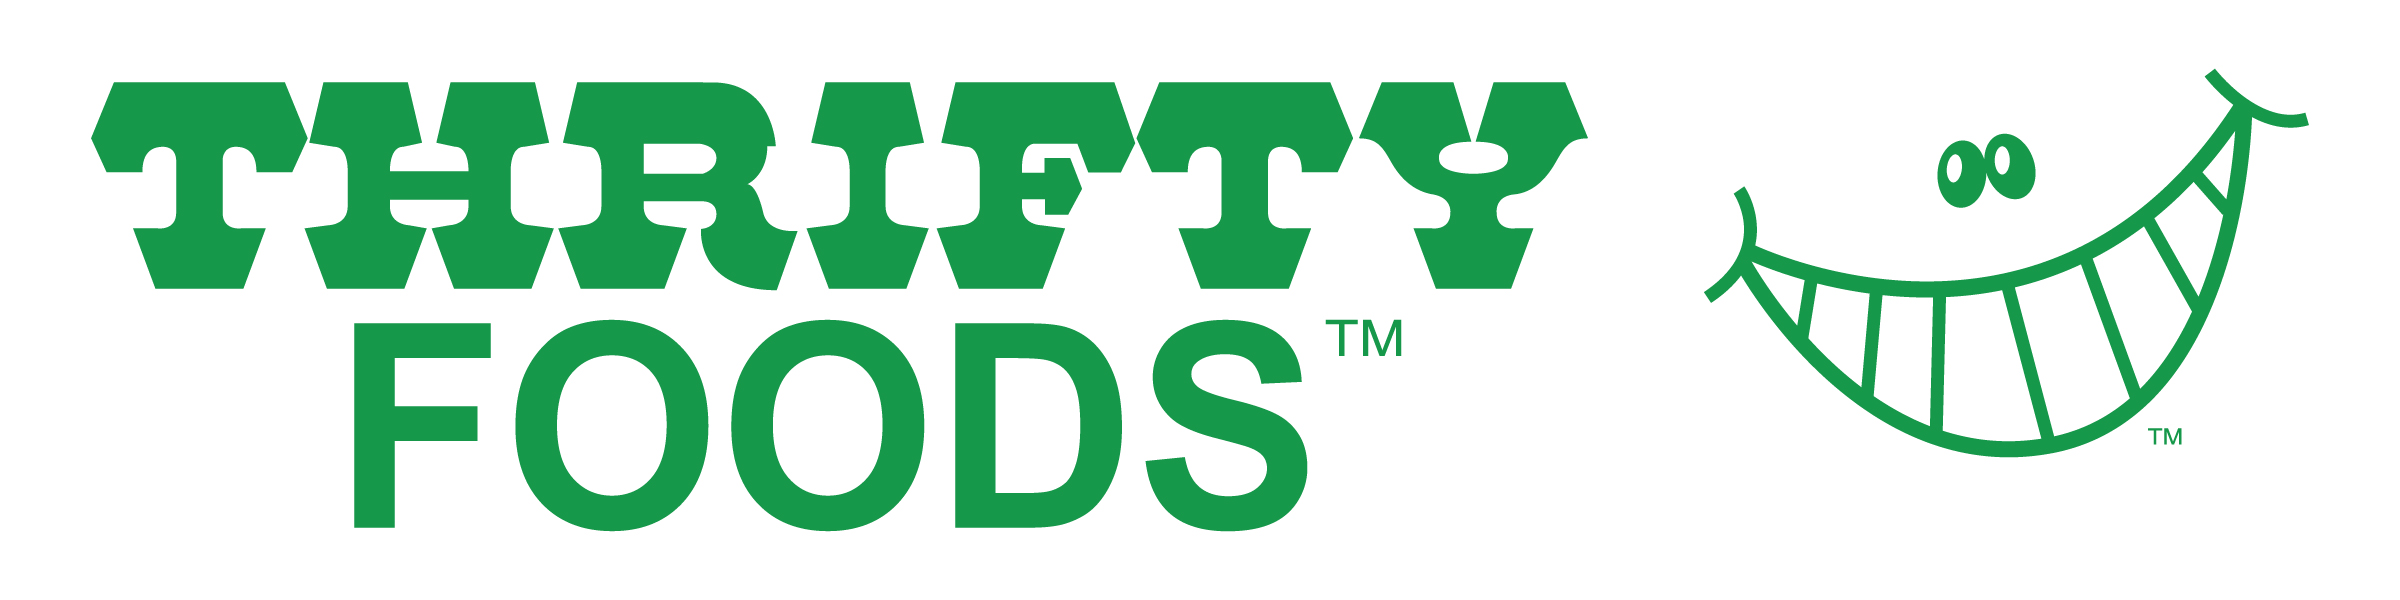 thrifty_foods.jpg